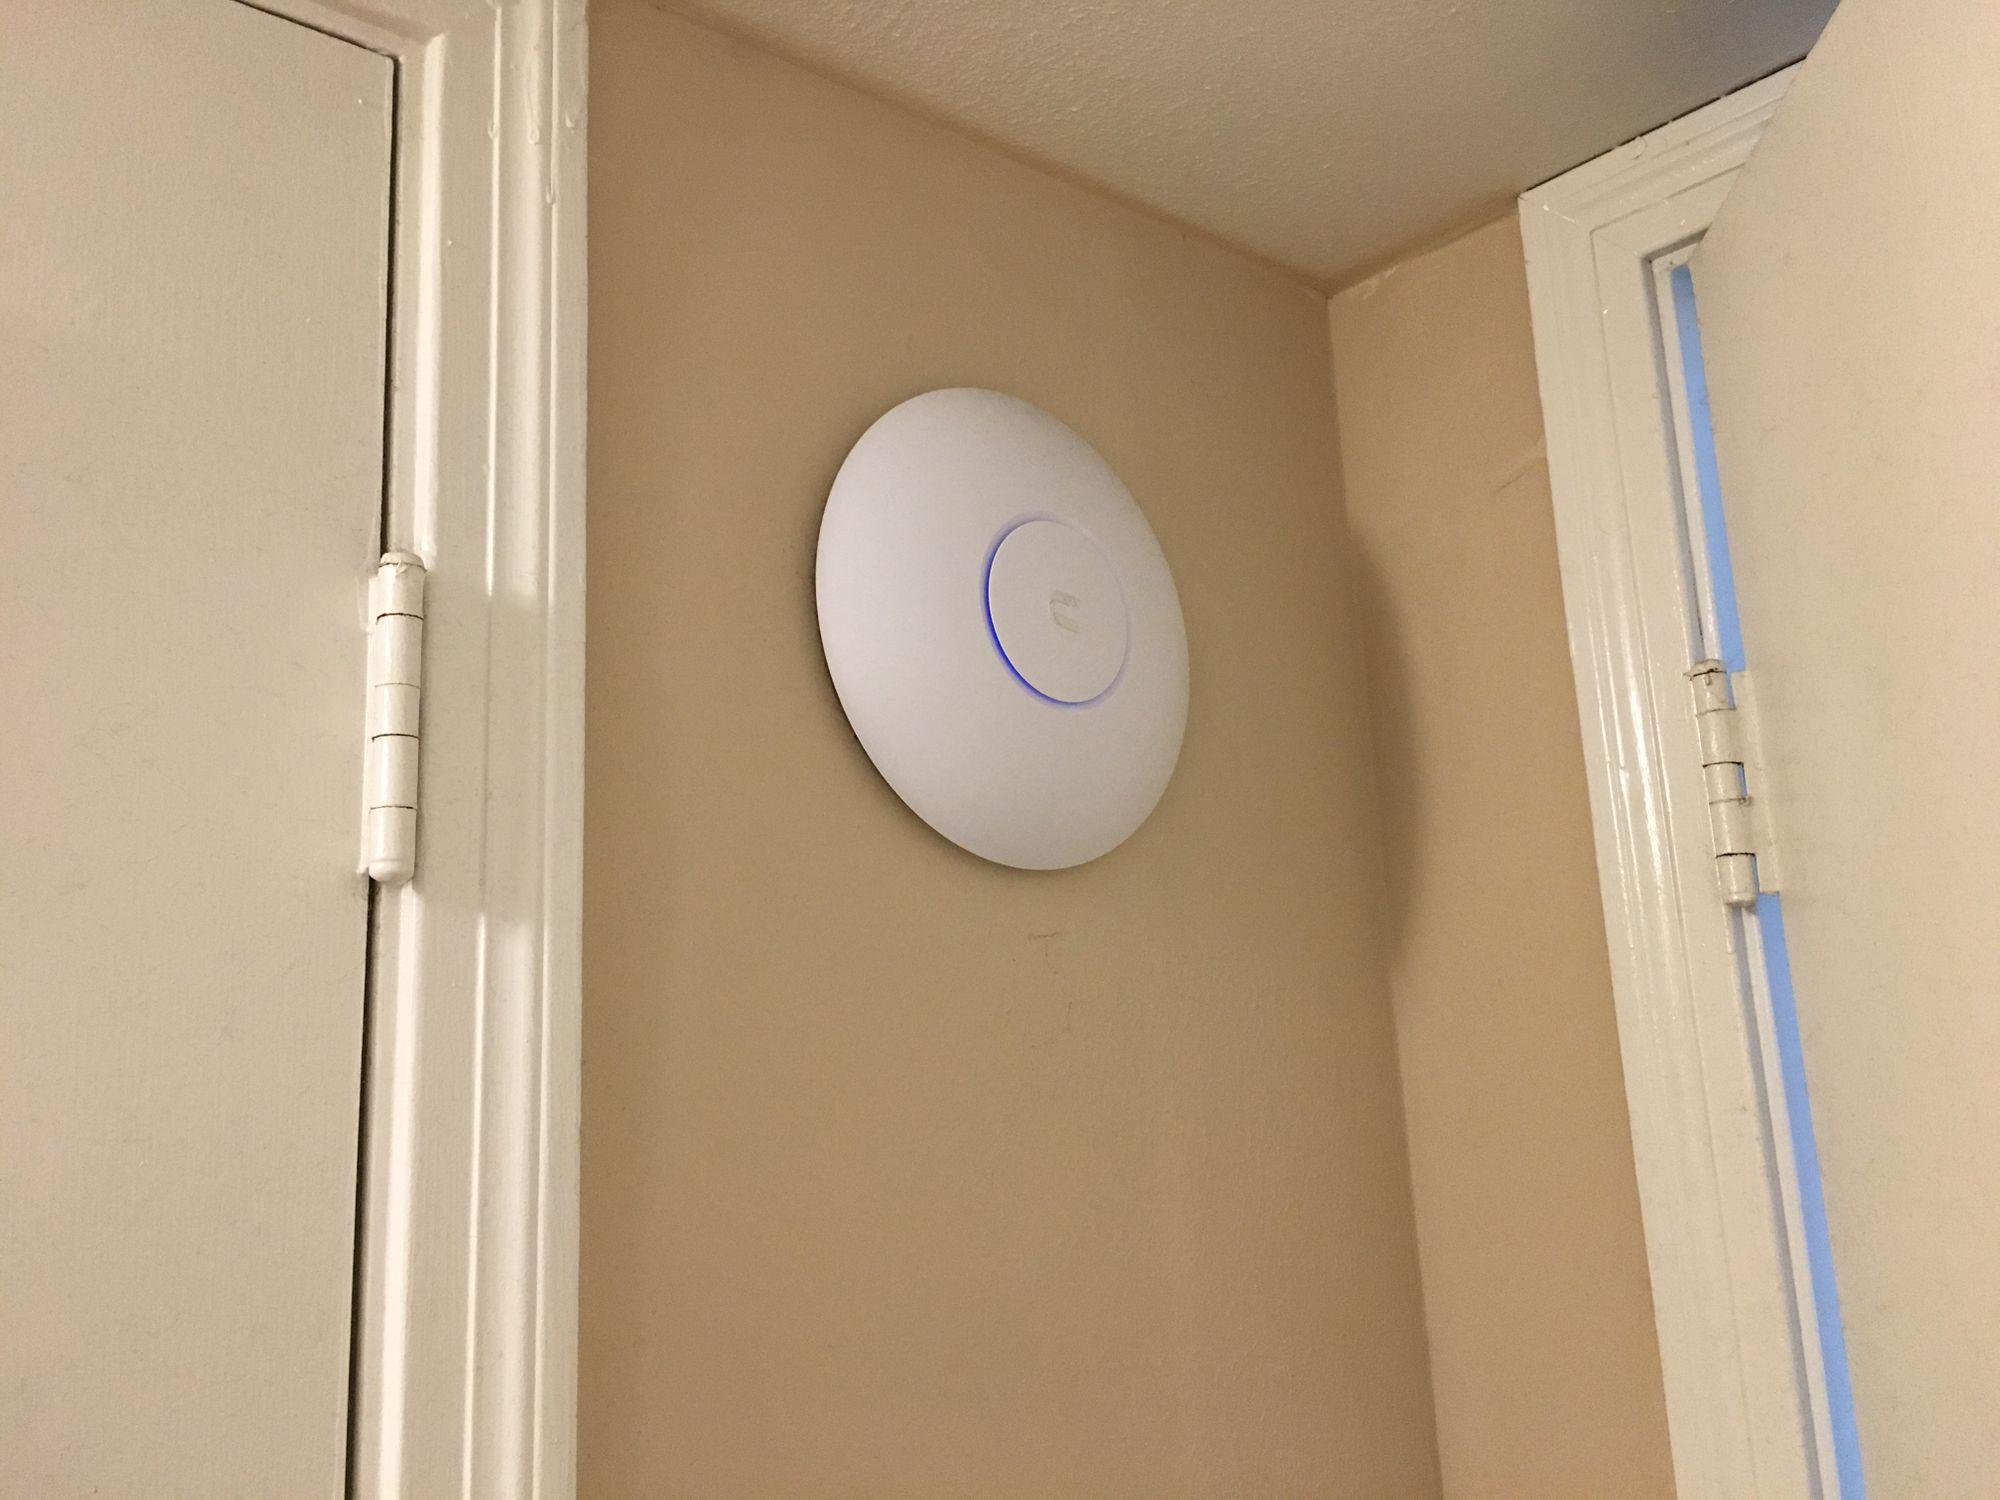 Ruckus R510 Home Install